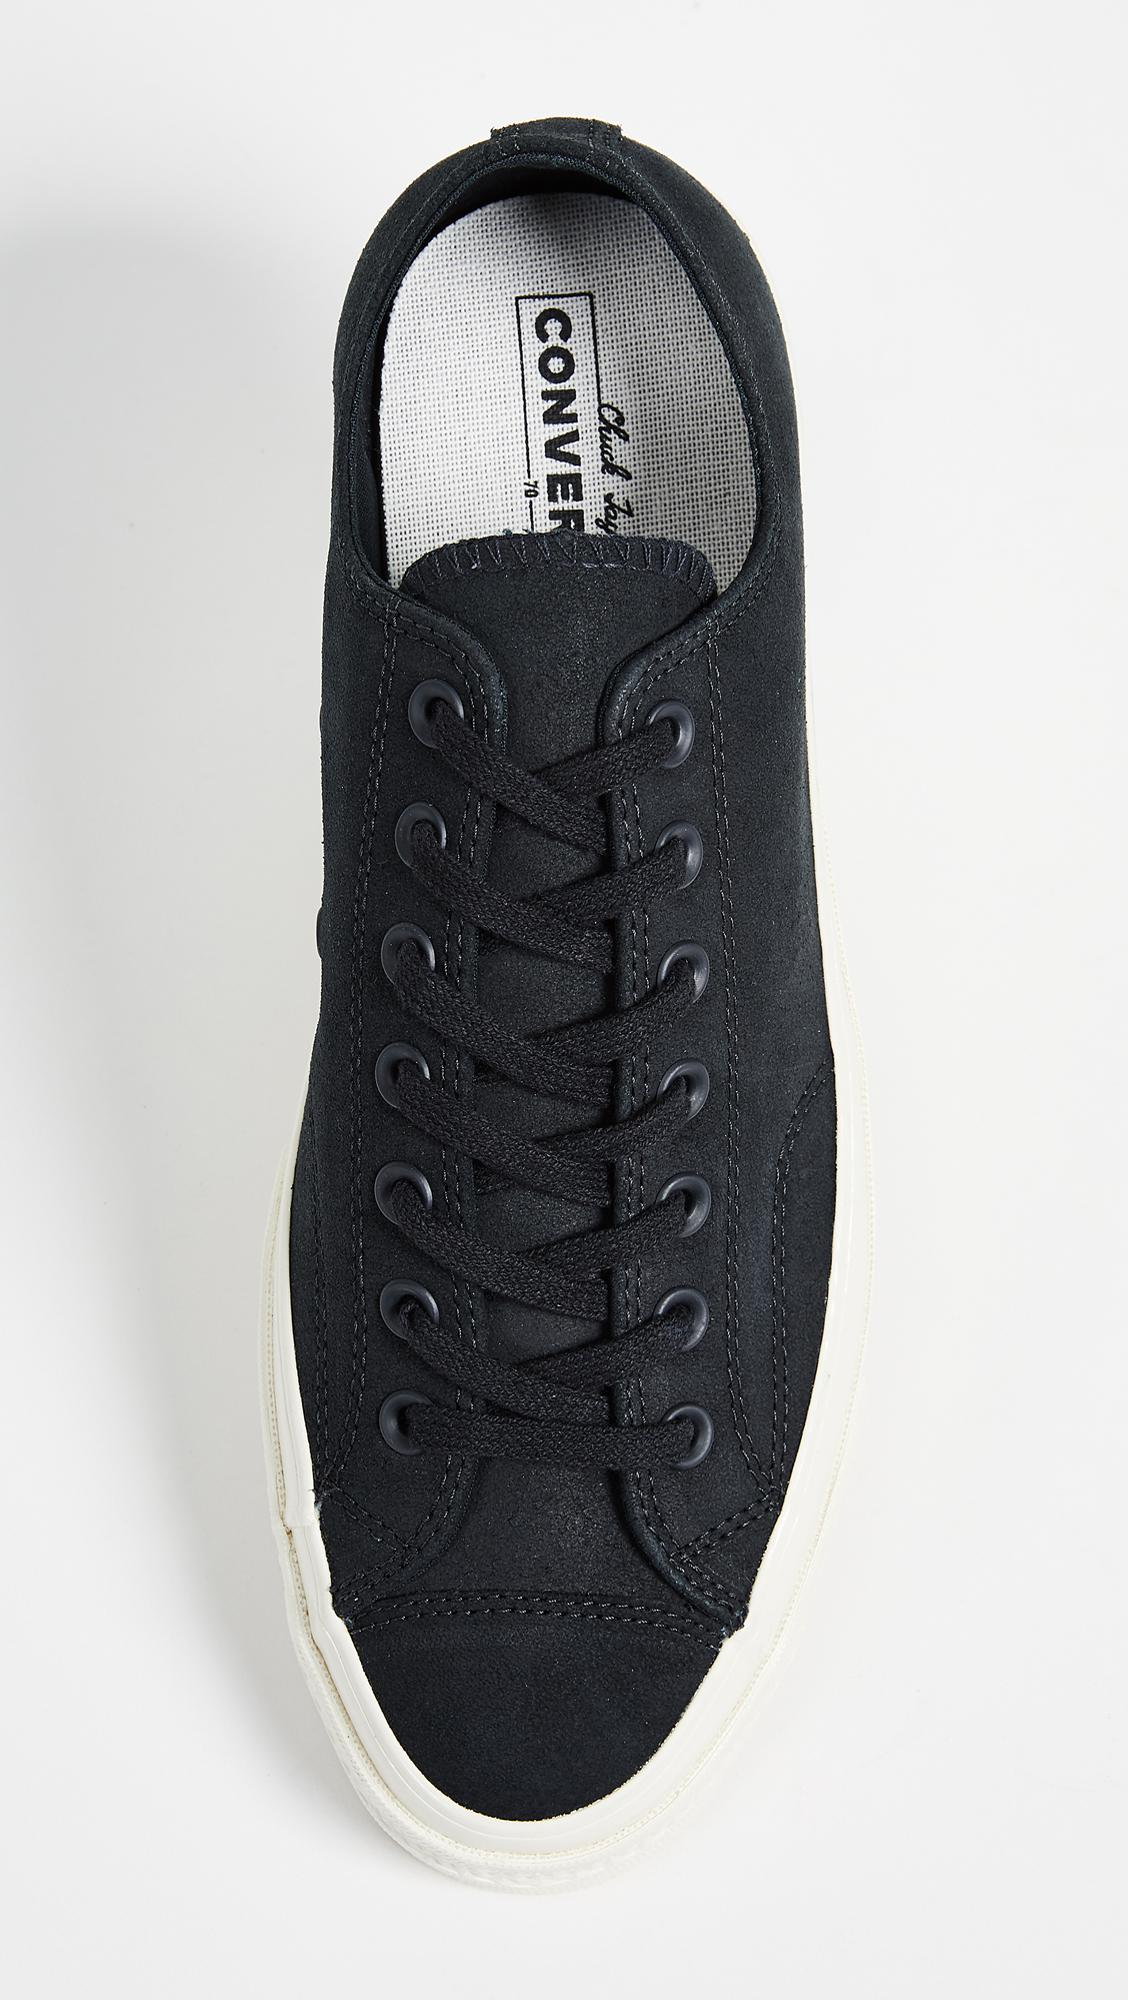 Converse Leather Chuck 70 Ox Nubuck